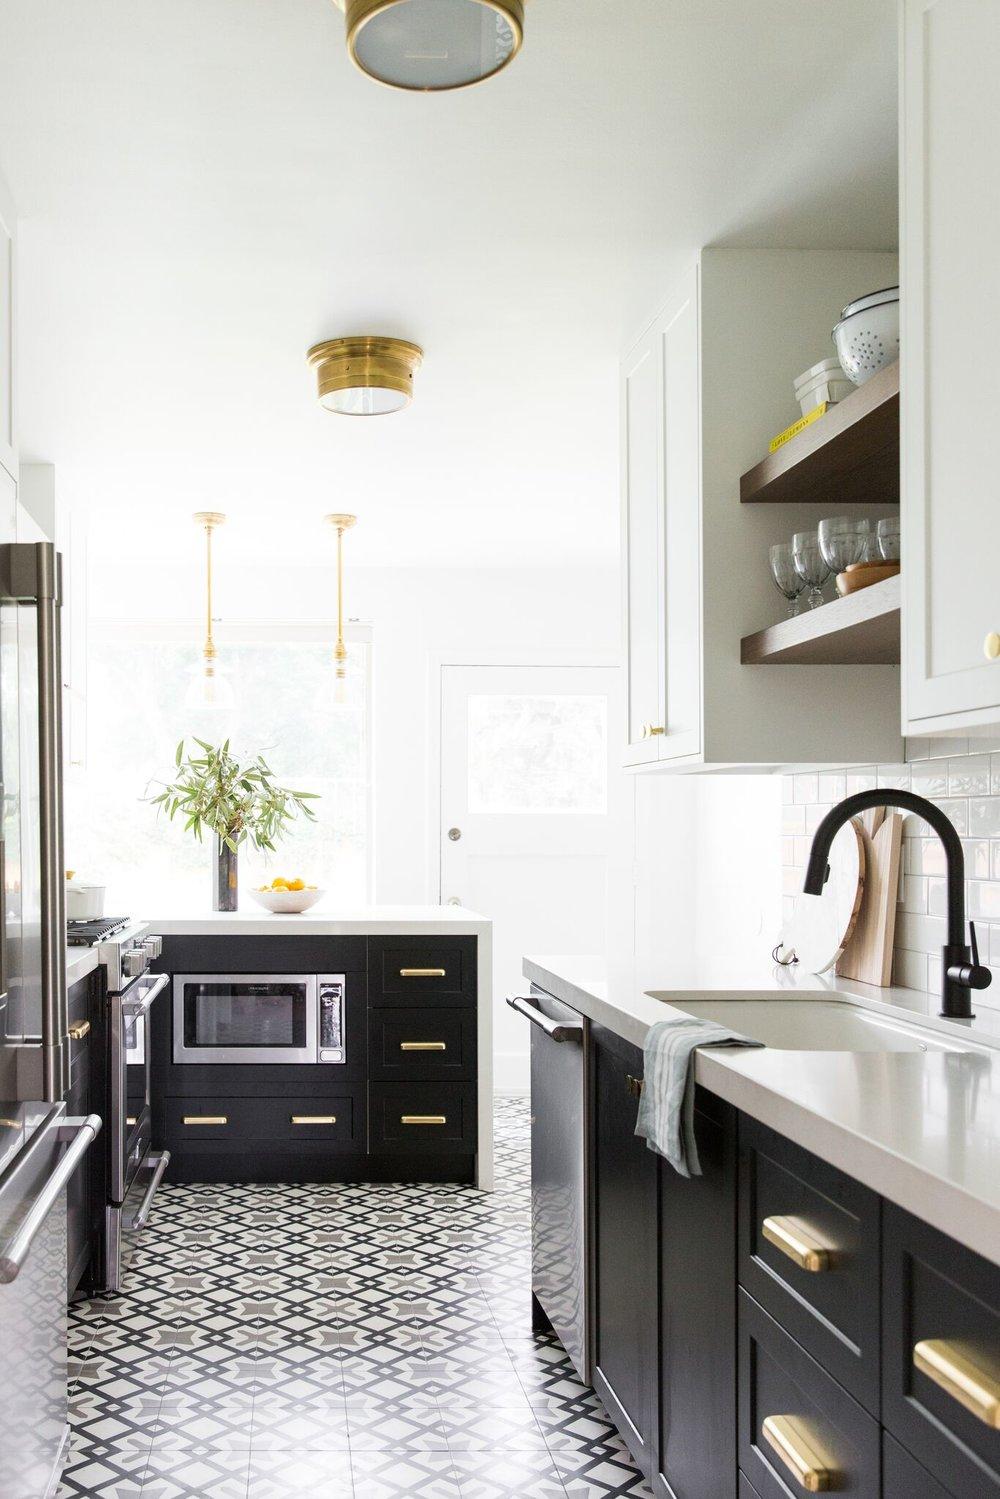 Hillside Kitchen Remodel Reveal — STUDIO MCGEE